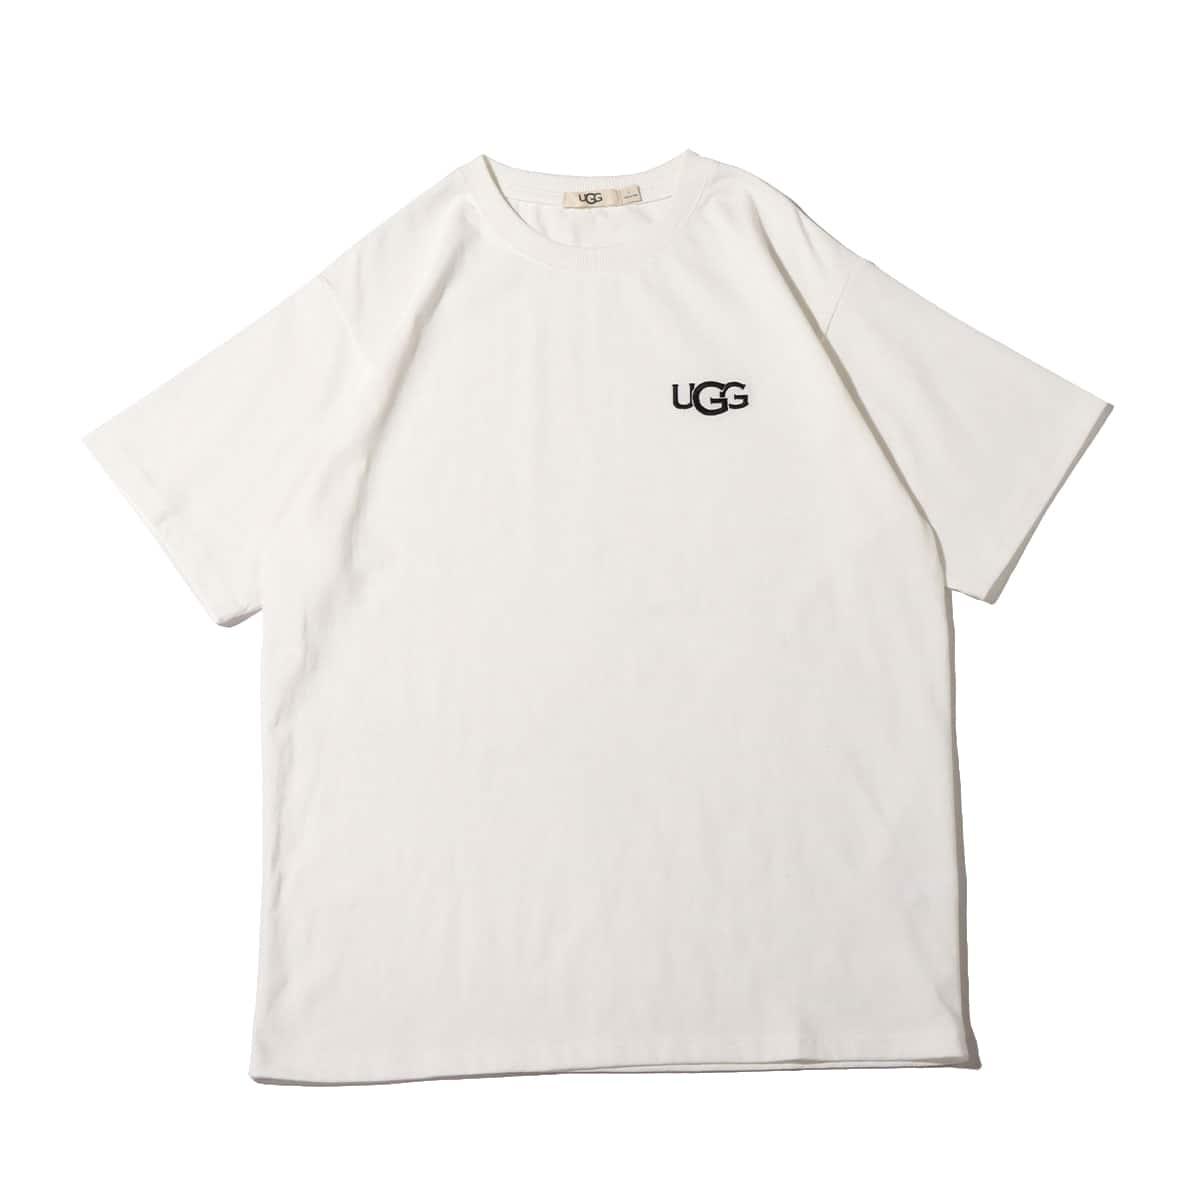 UGG ロゴ刺繍 Tシャツ WHITE 21SS-I_photo_large